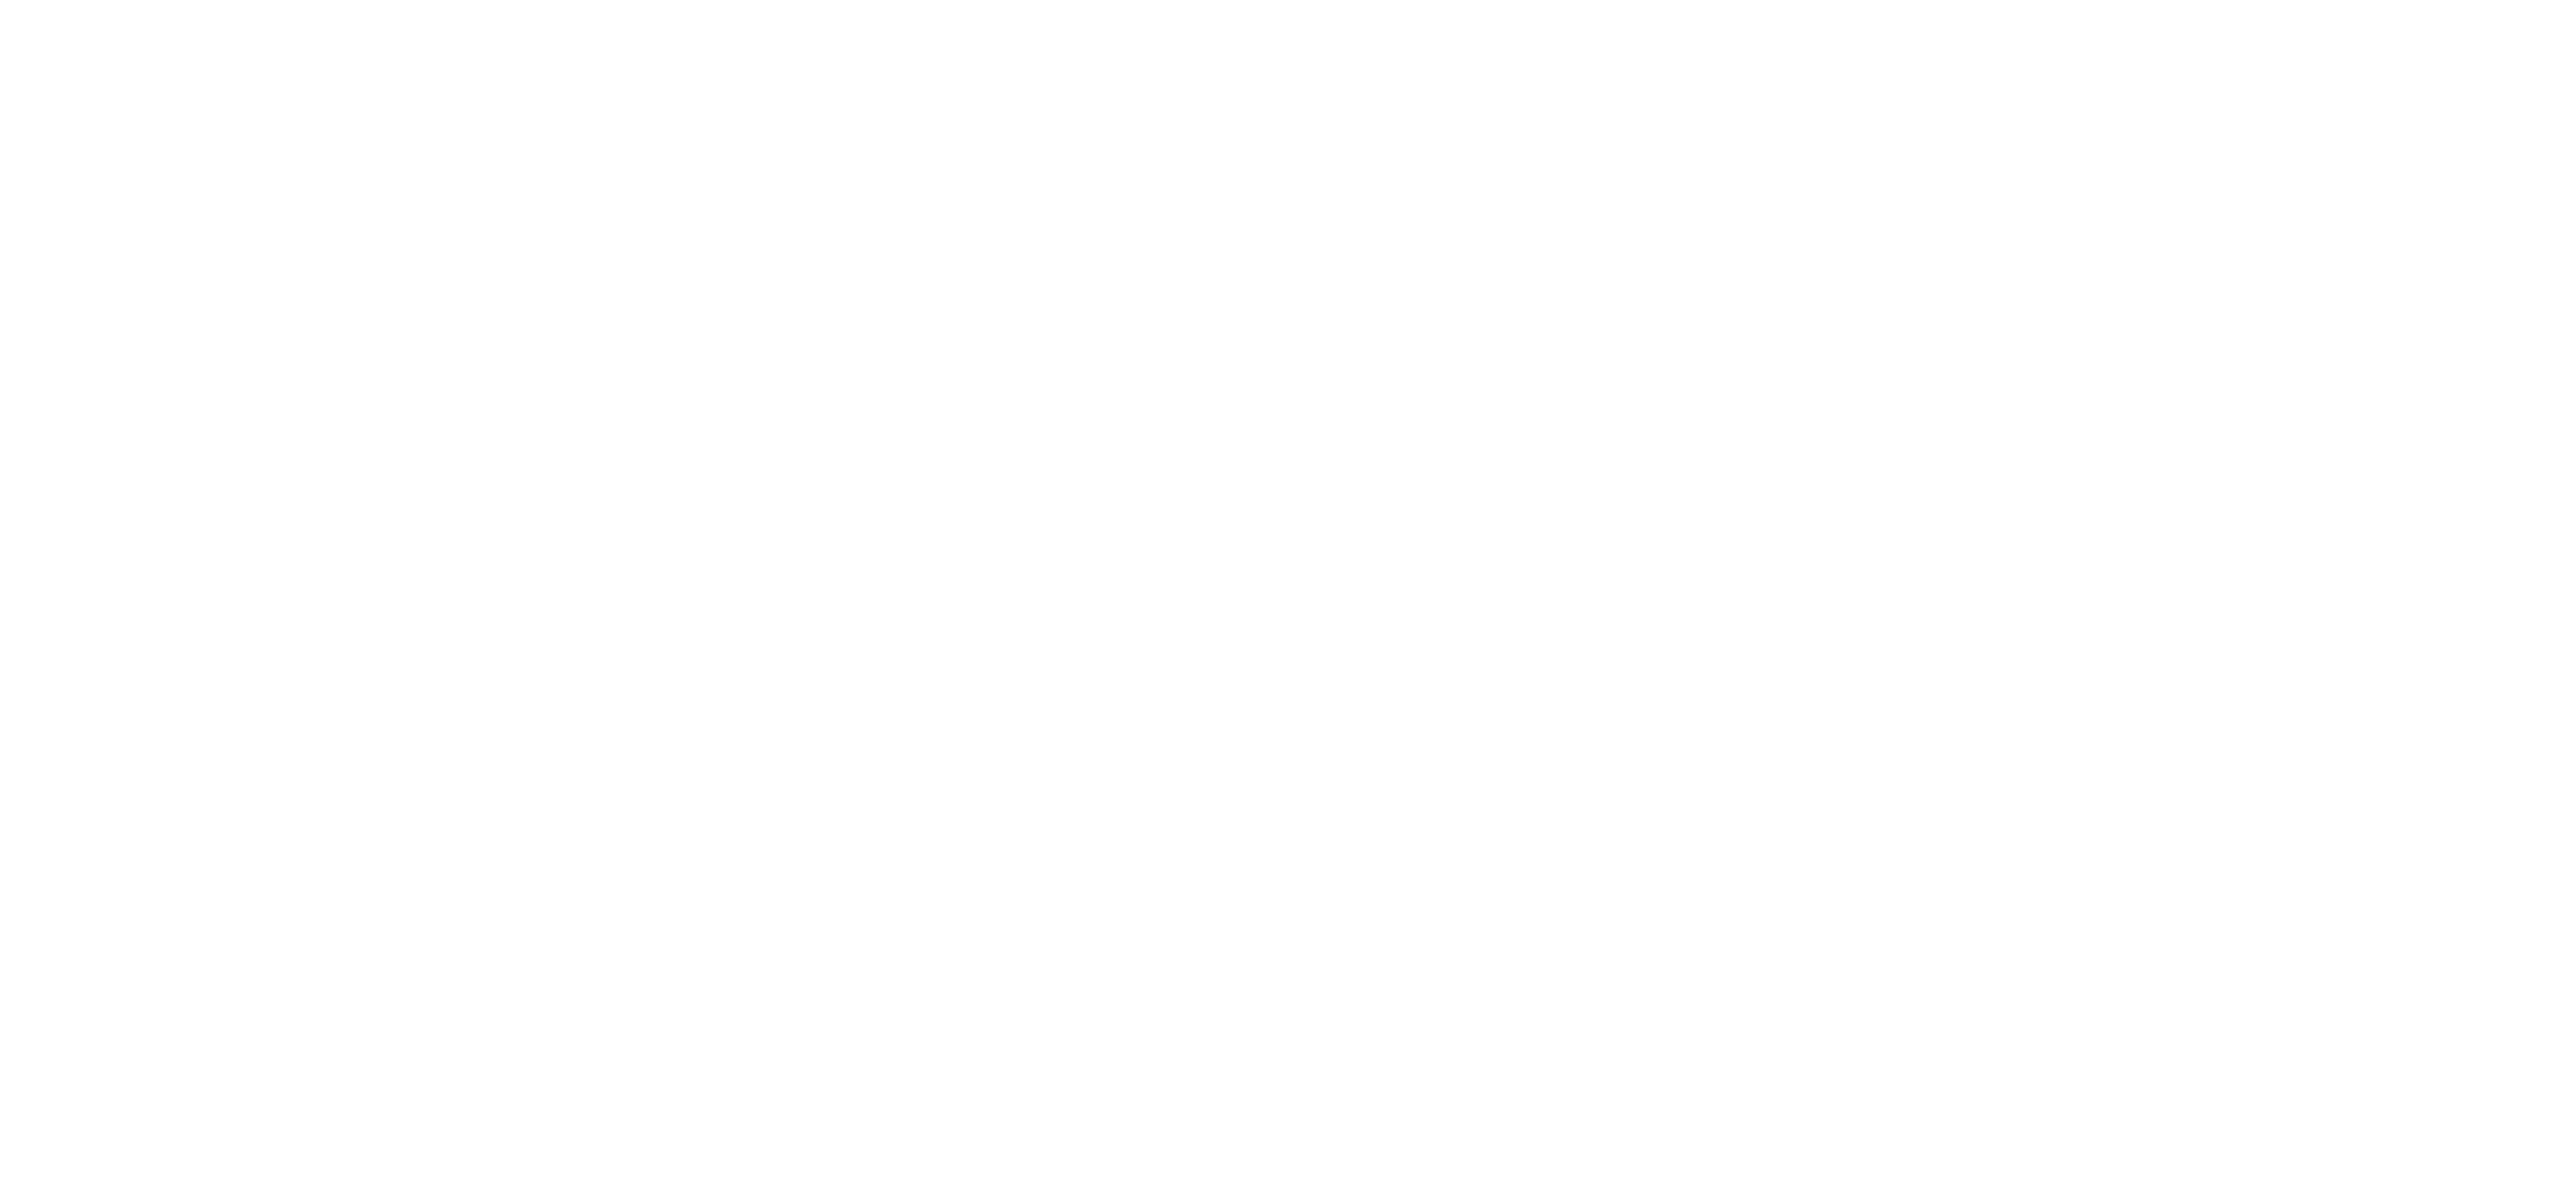 LOHMANN AND FRIENDS